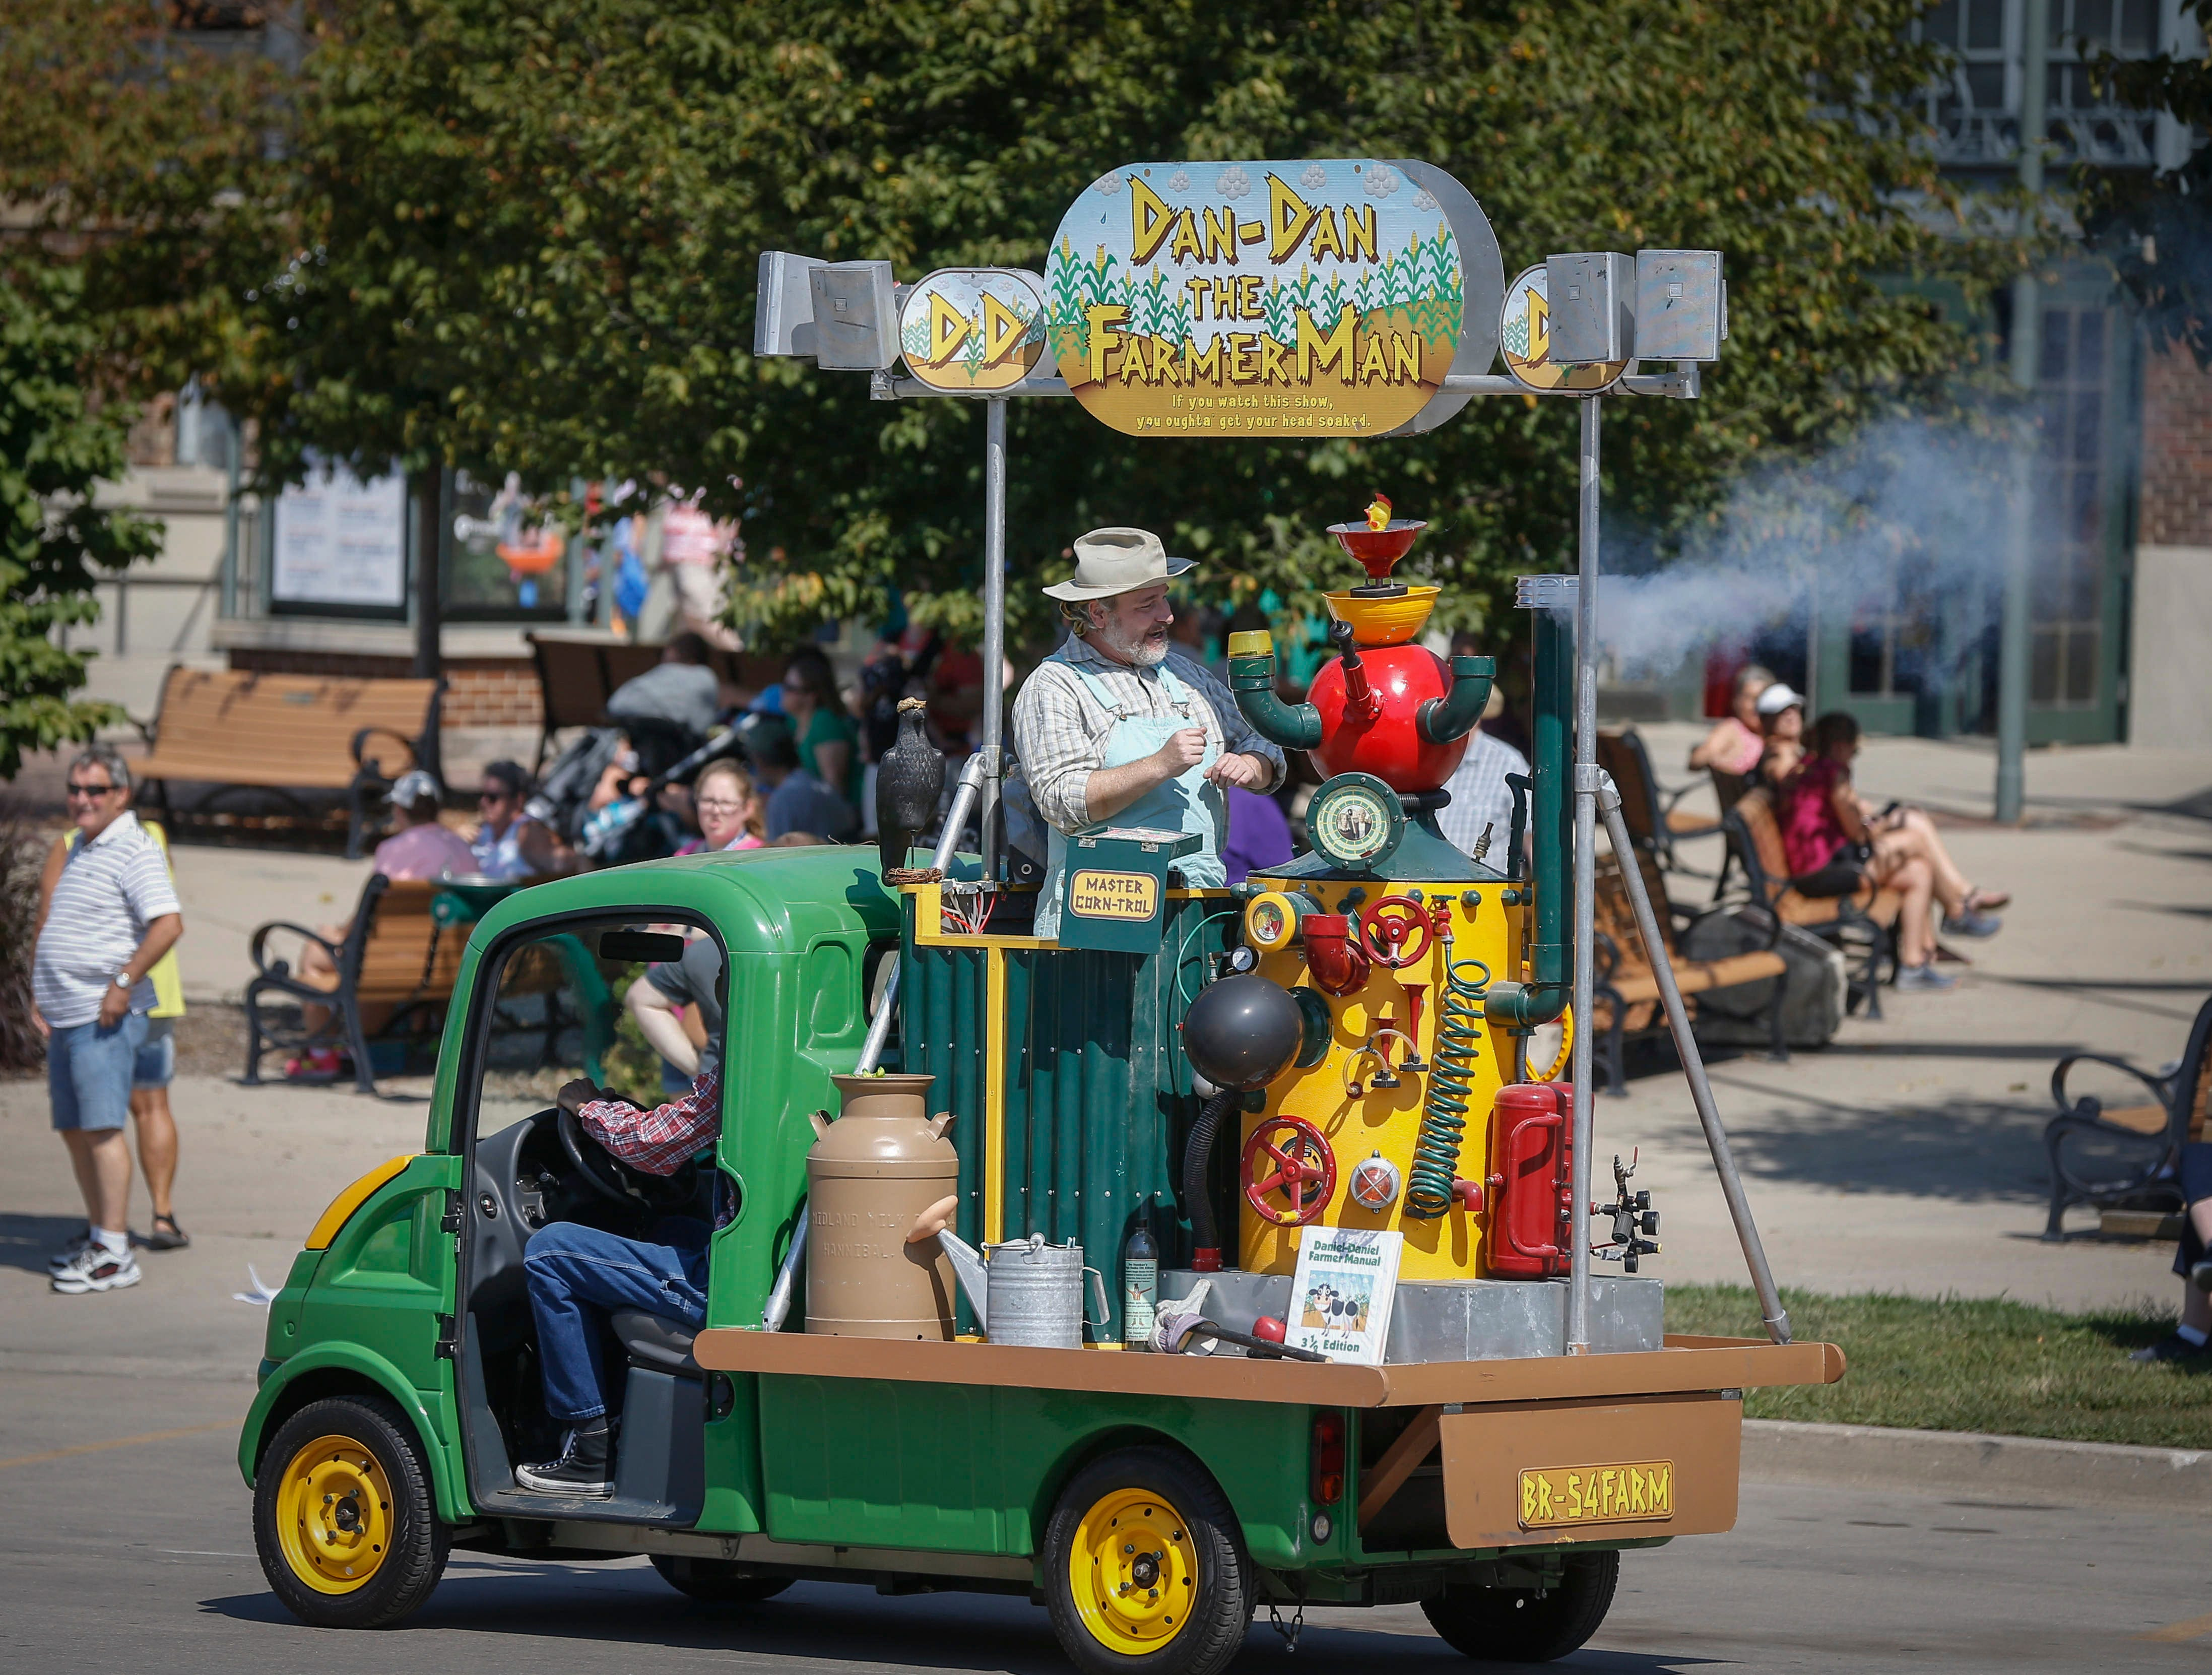 Dan-Dan the Farmer Man operates his truck down the street during the Iowa State Fair in Des Moines.